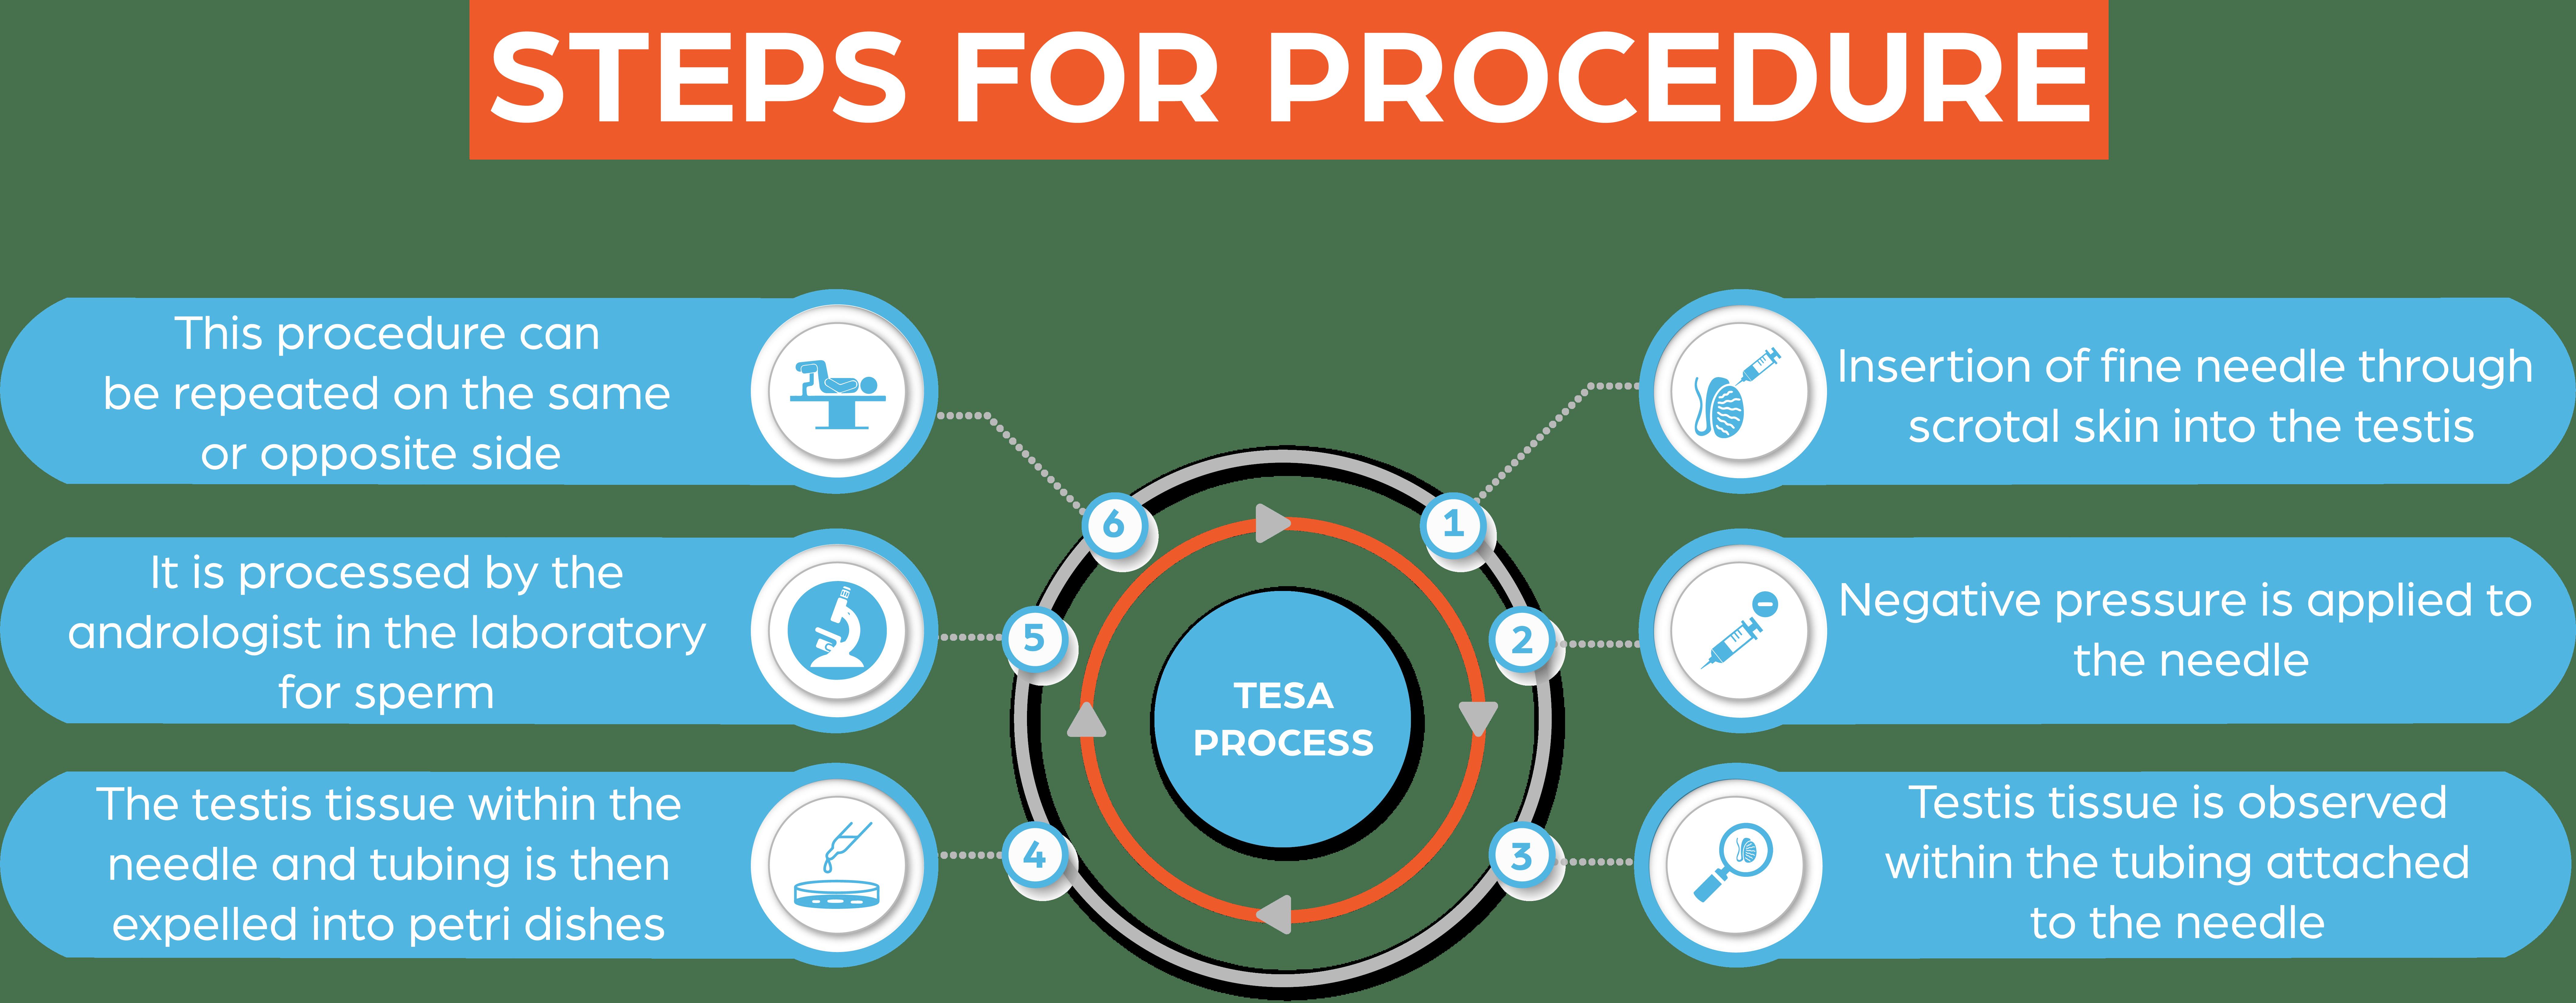 TESA - Steps for Procedure